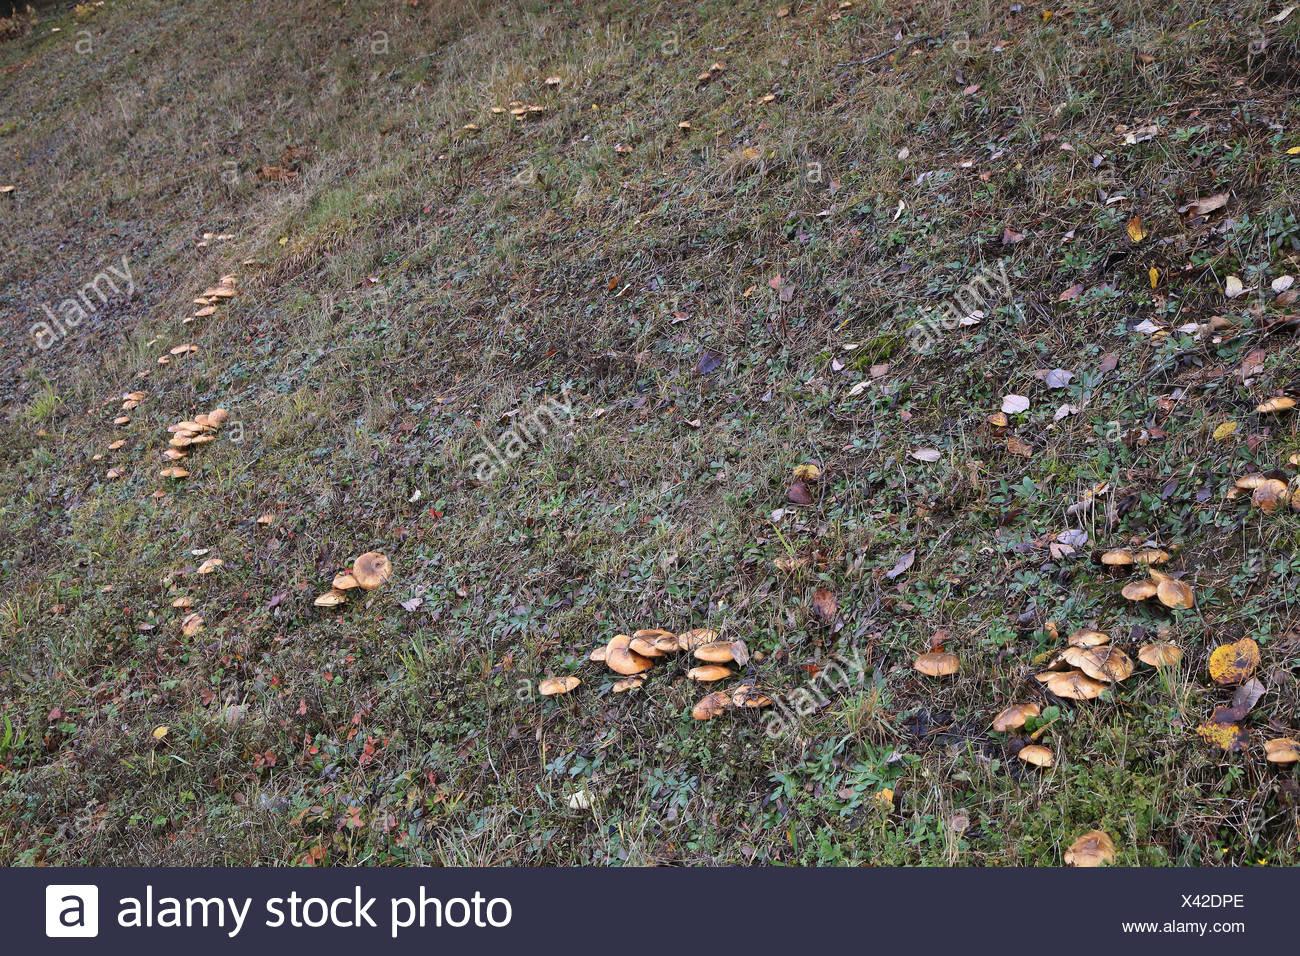 Fairy ring of slippery jack, suillus luteus - Stock Image